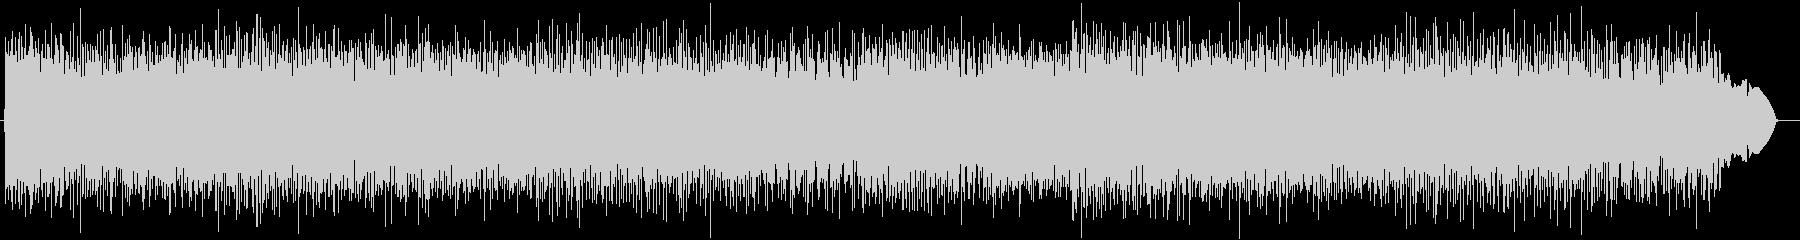 HARDROCK、激しい、BGM282の未再生の波形